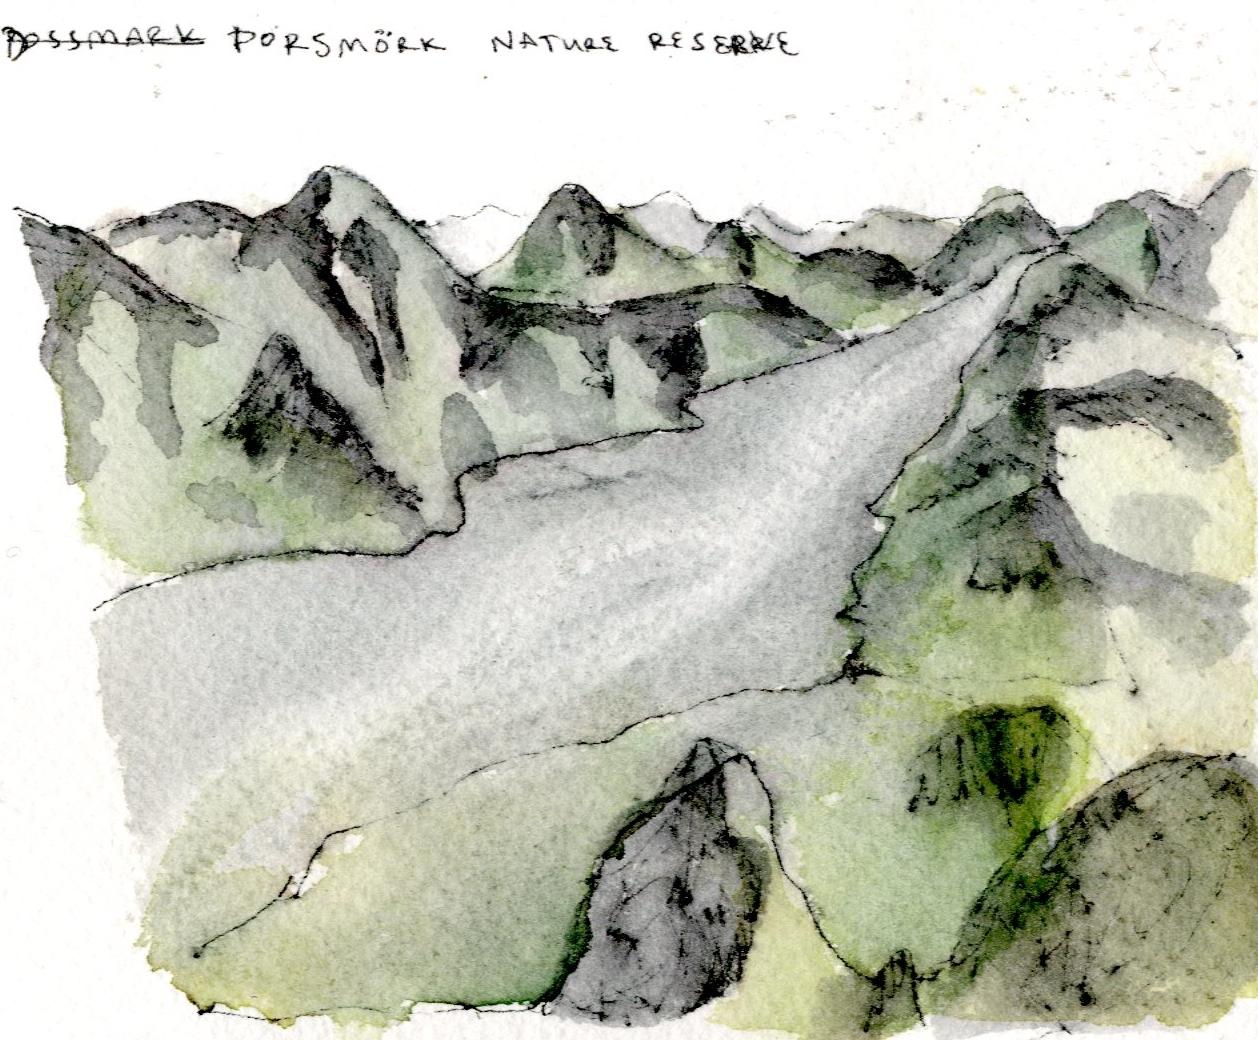 Thorsmork Nature Reserve.jpg